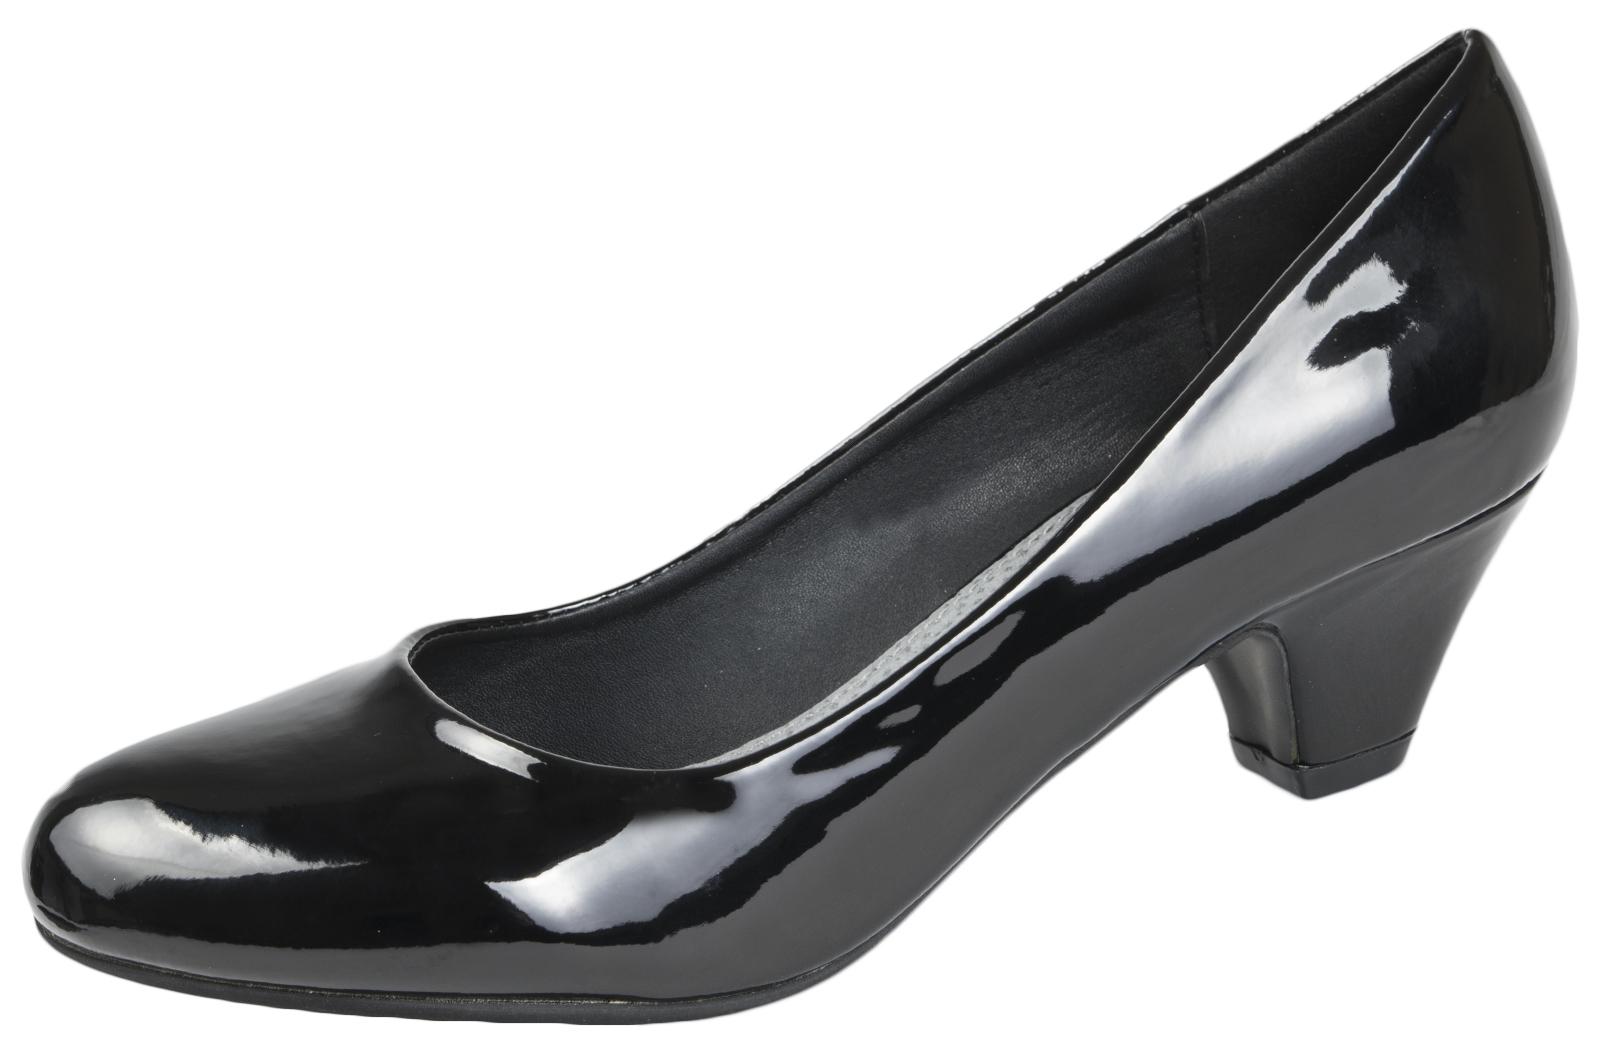 Ladies-Leather-Lined-Low-Block-Heels-Comfort-Work-Office-Court-Shoes-Ladies-Size miniatuur 36